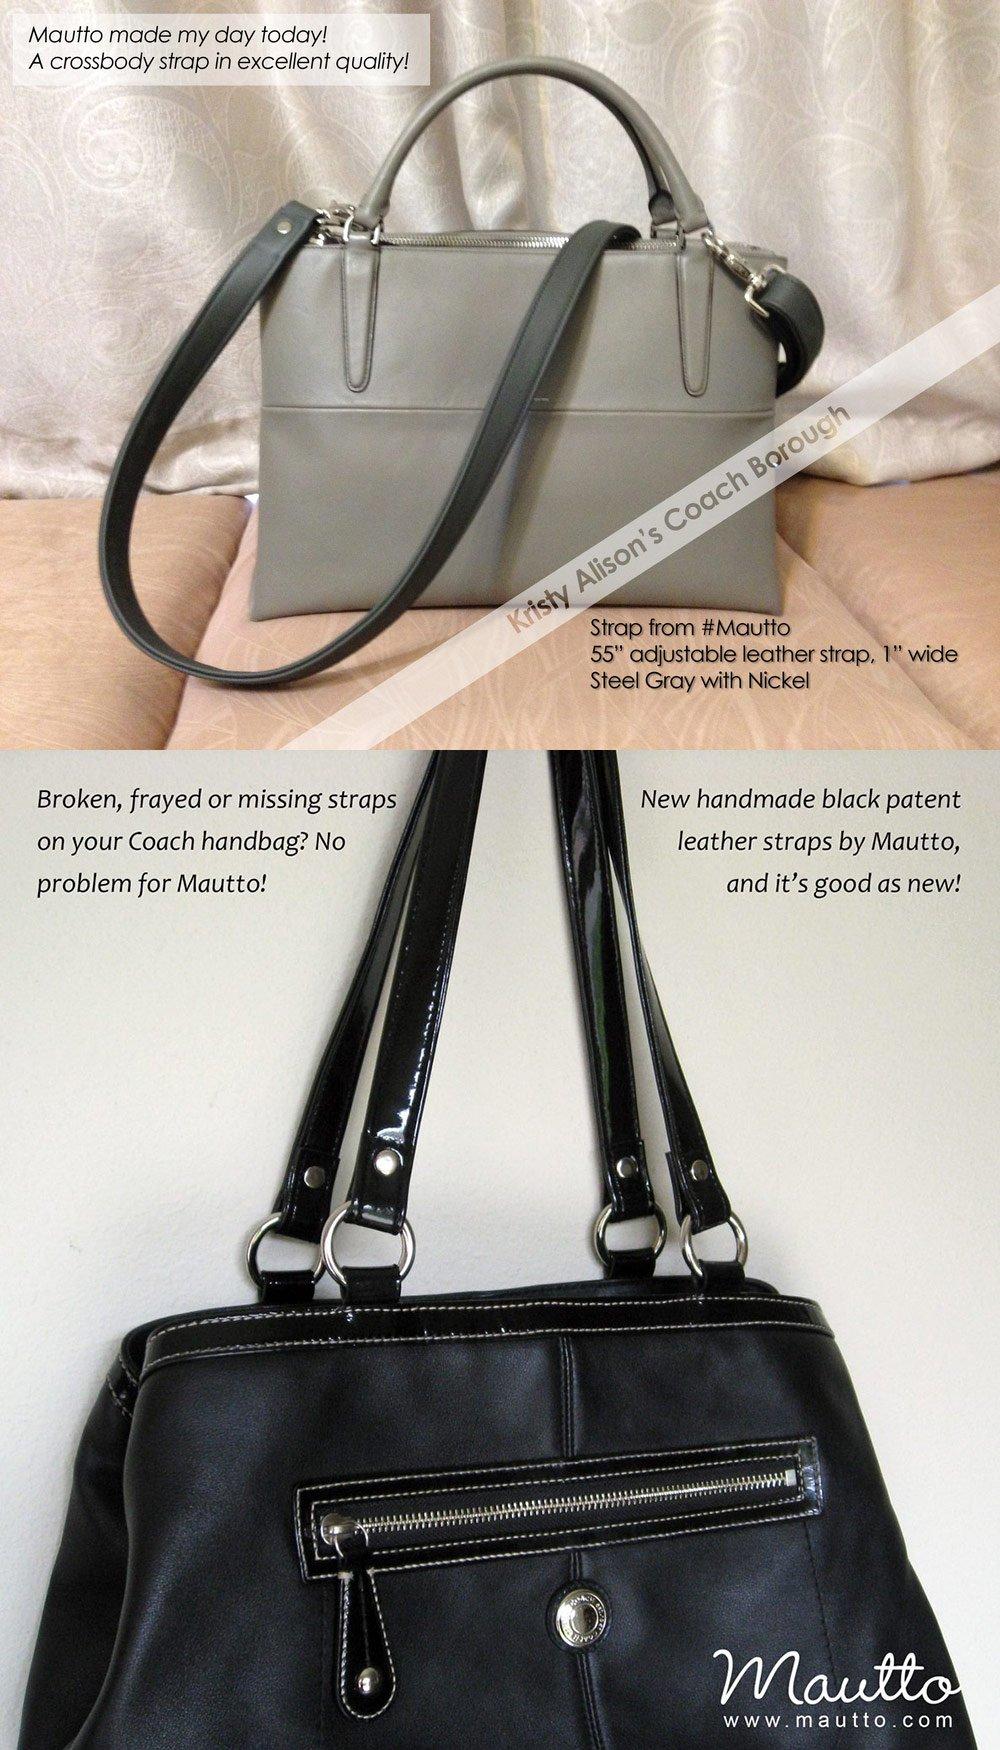 ab3690e3bcf Custom Replacement Straps & Handles for Coach Handbags/Purses/Bags